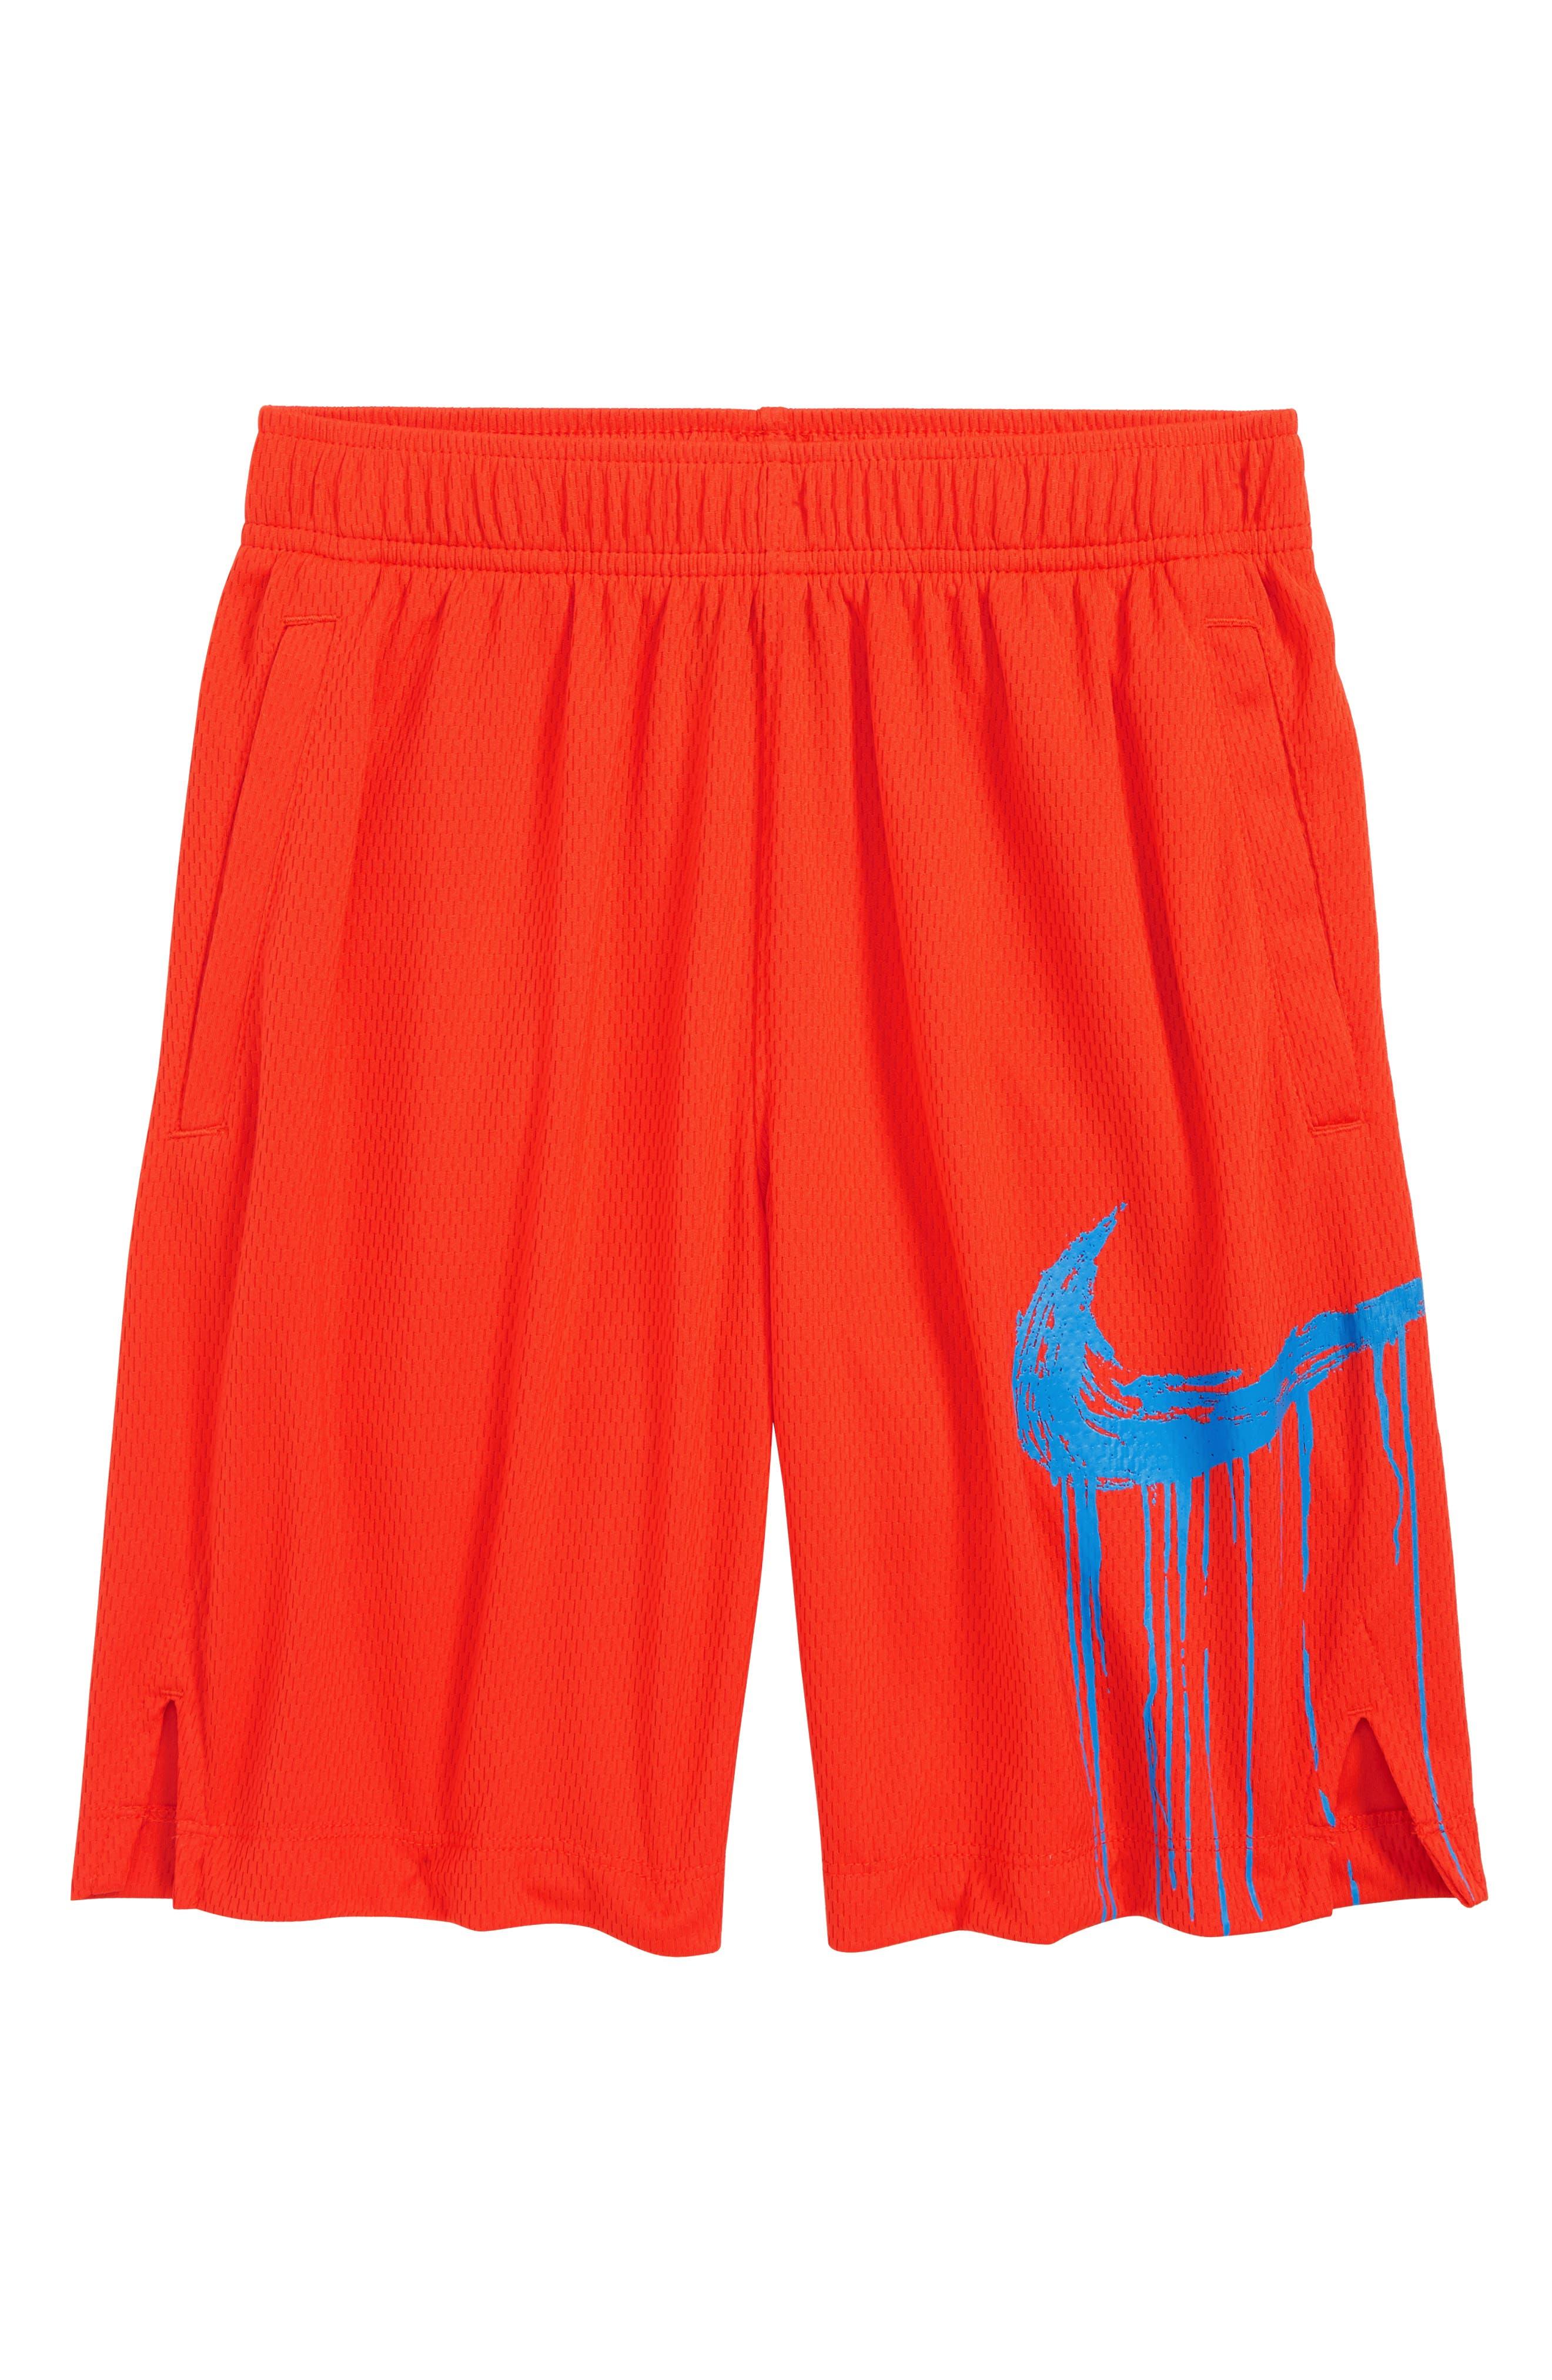 Boys Nike Dry Gfx Shorts Size XL (16)  Red